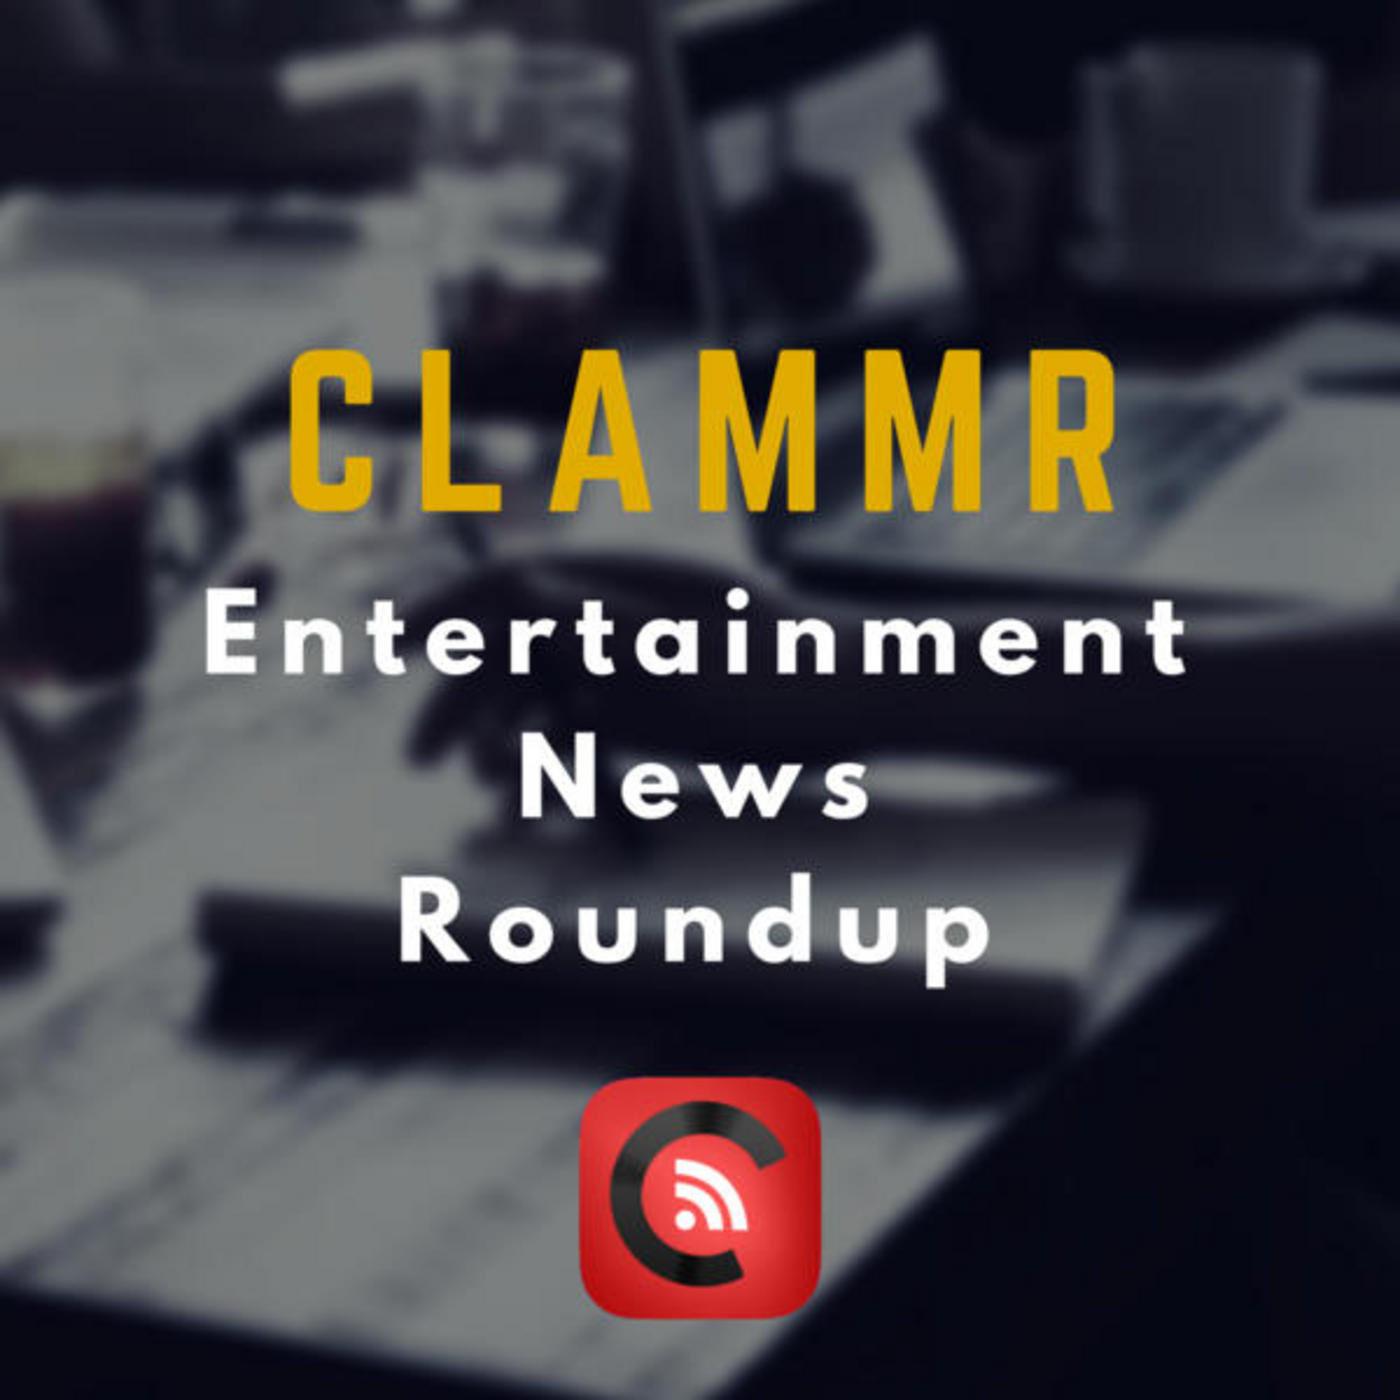 011 Clammr Entertainment News Roundup - 20150716